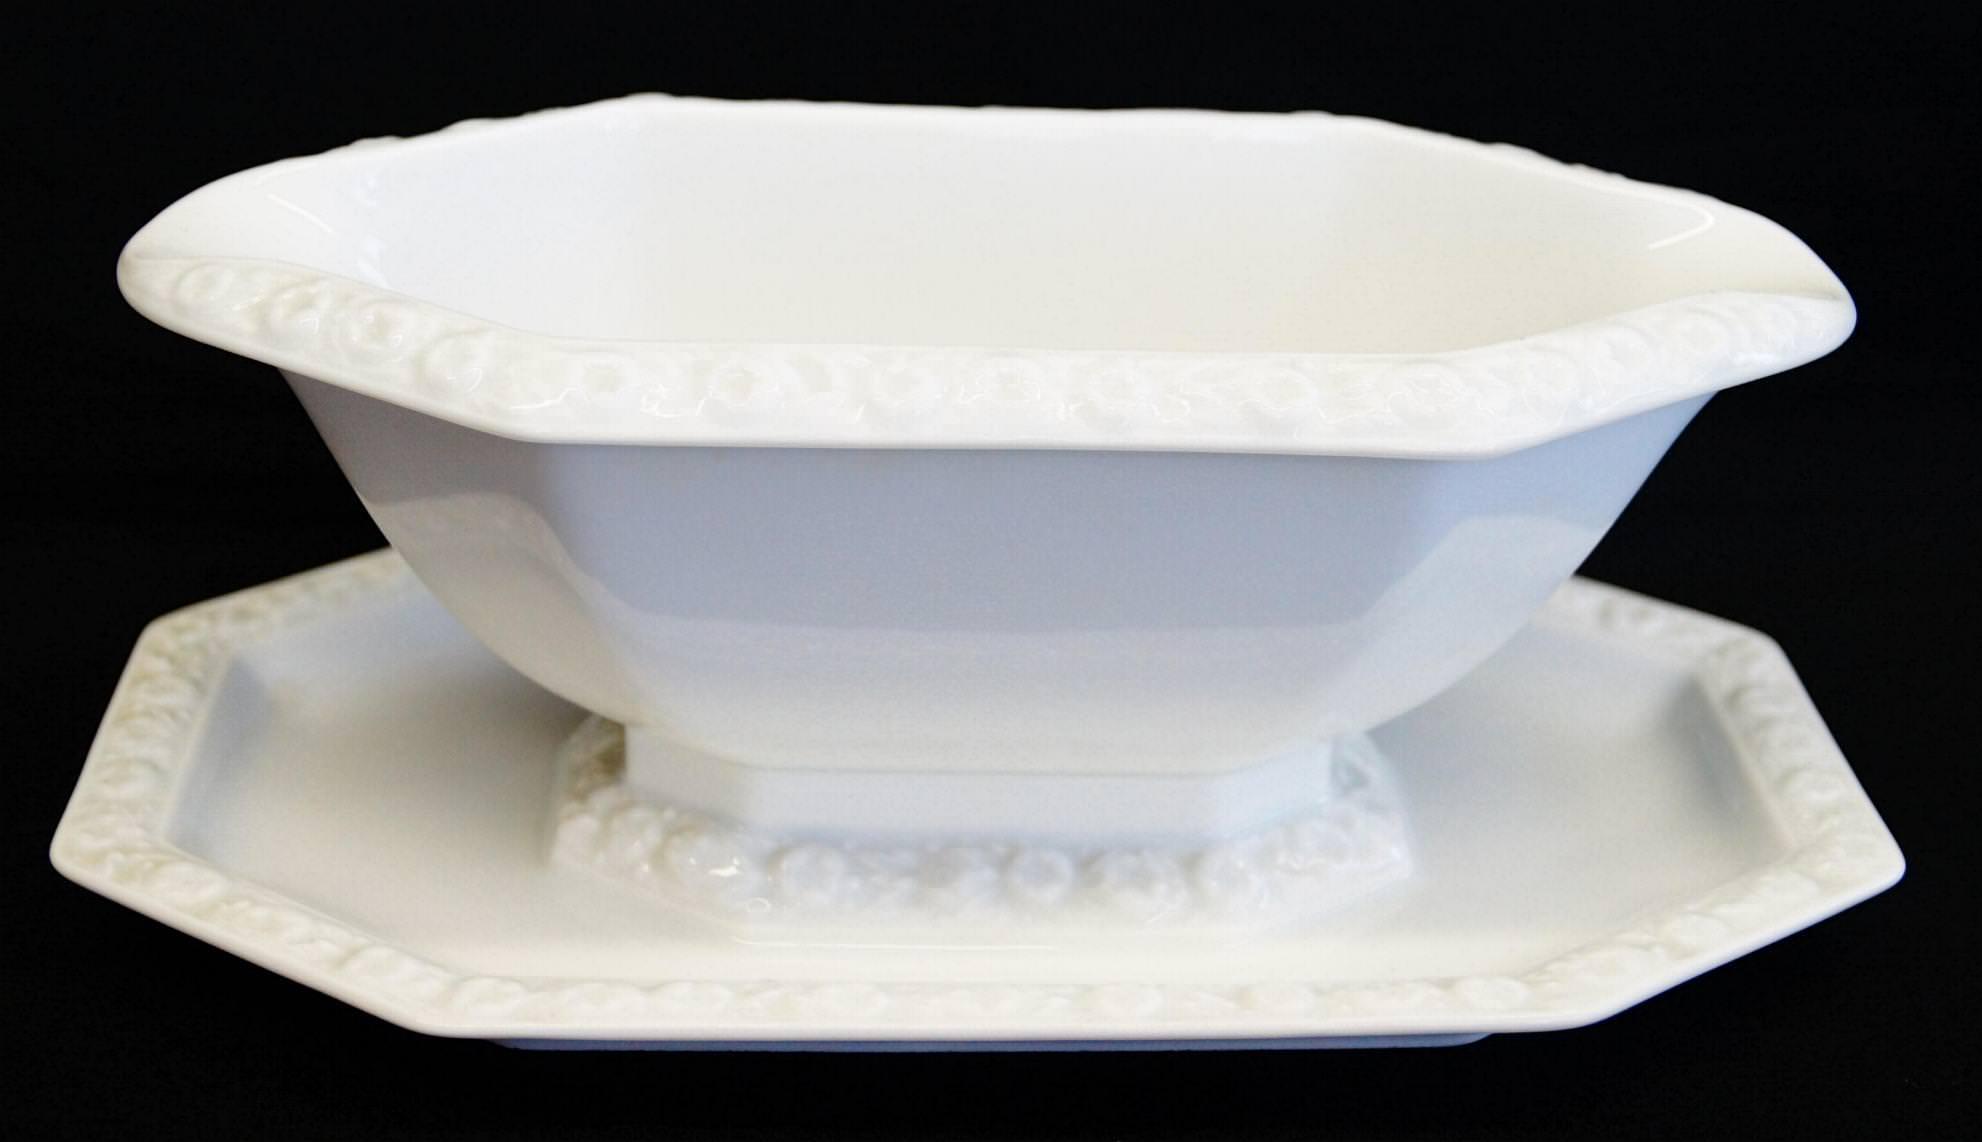 rosenthal maria weiss sauciere mit festem teller 578 5065. Black Bedroom Furniture Sets. Home Design Ideas